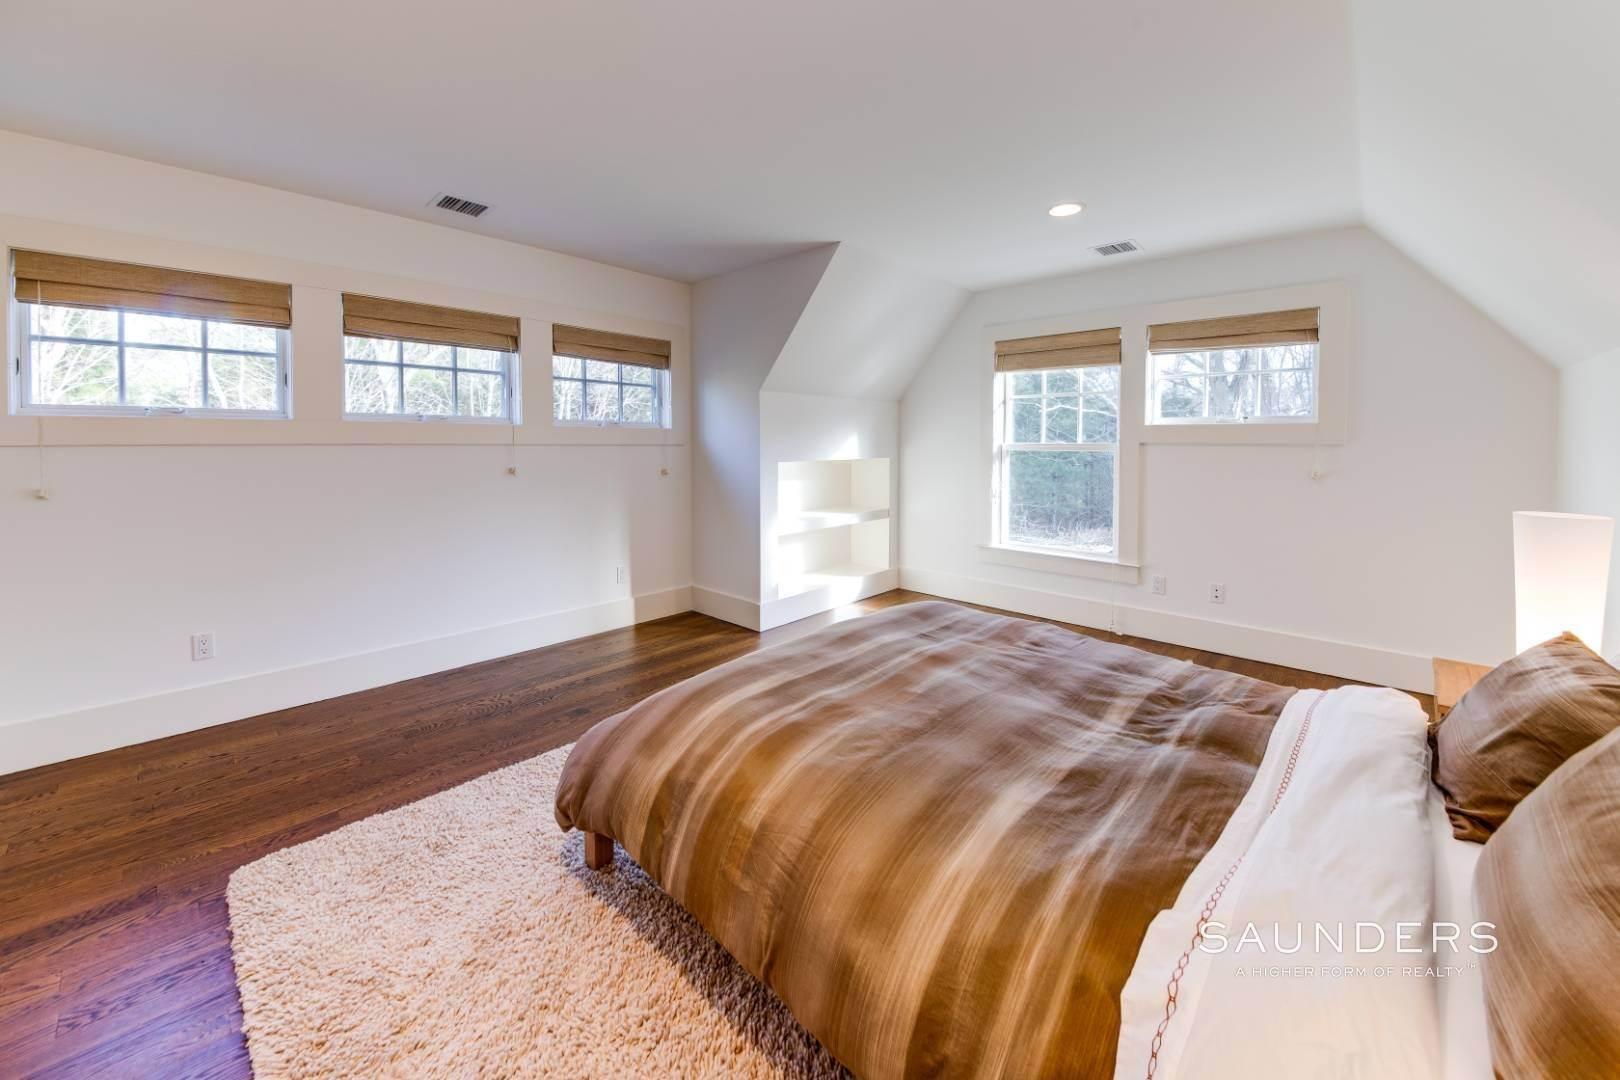 17. Single Family Homes for Sale at Wainscott South Traditional Near Beach Lane 10 Merriwood Drive, Wainscott, East Hampton Town, NY 11975